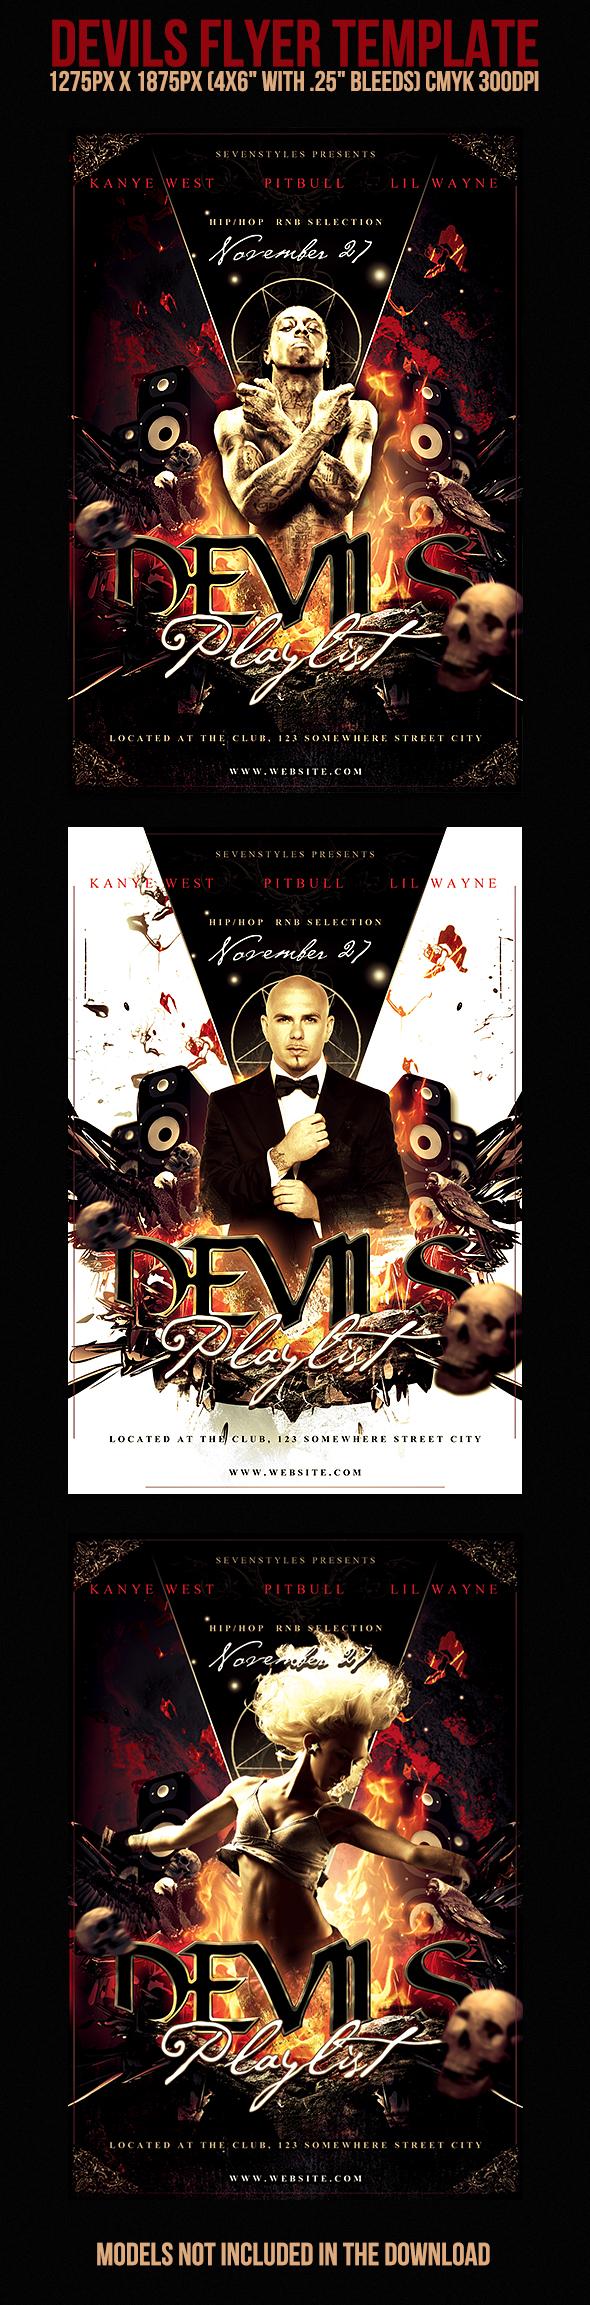 DevilsTemplate_PreviewImage2.jpg